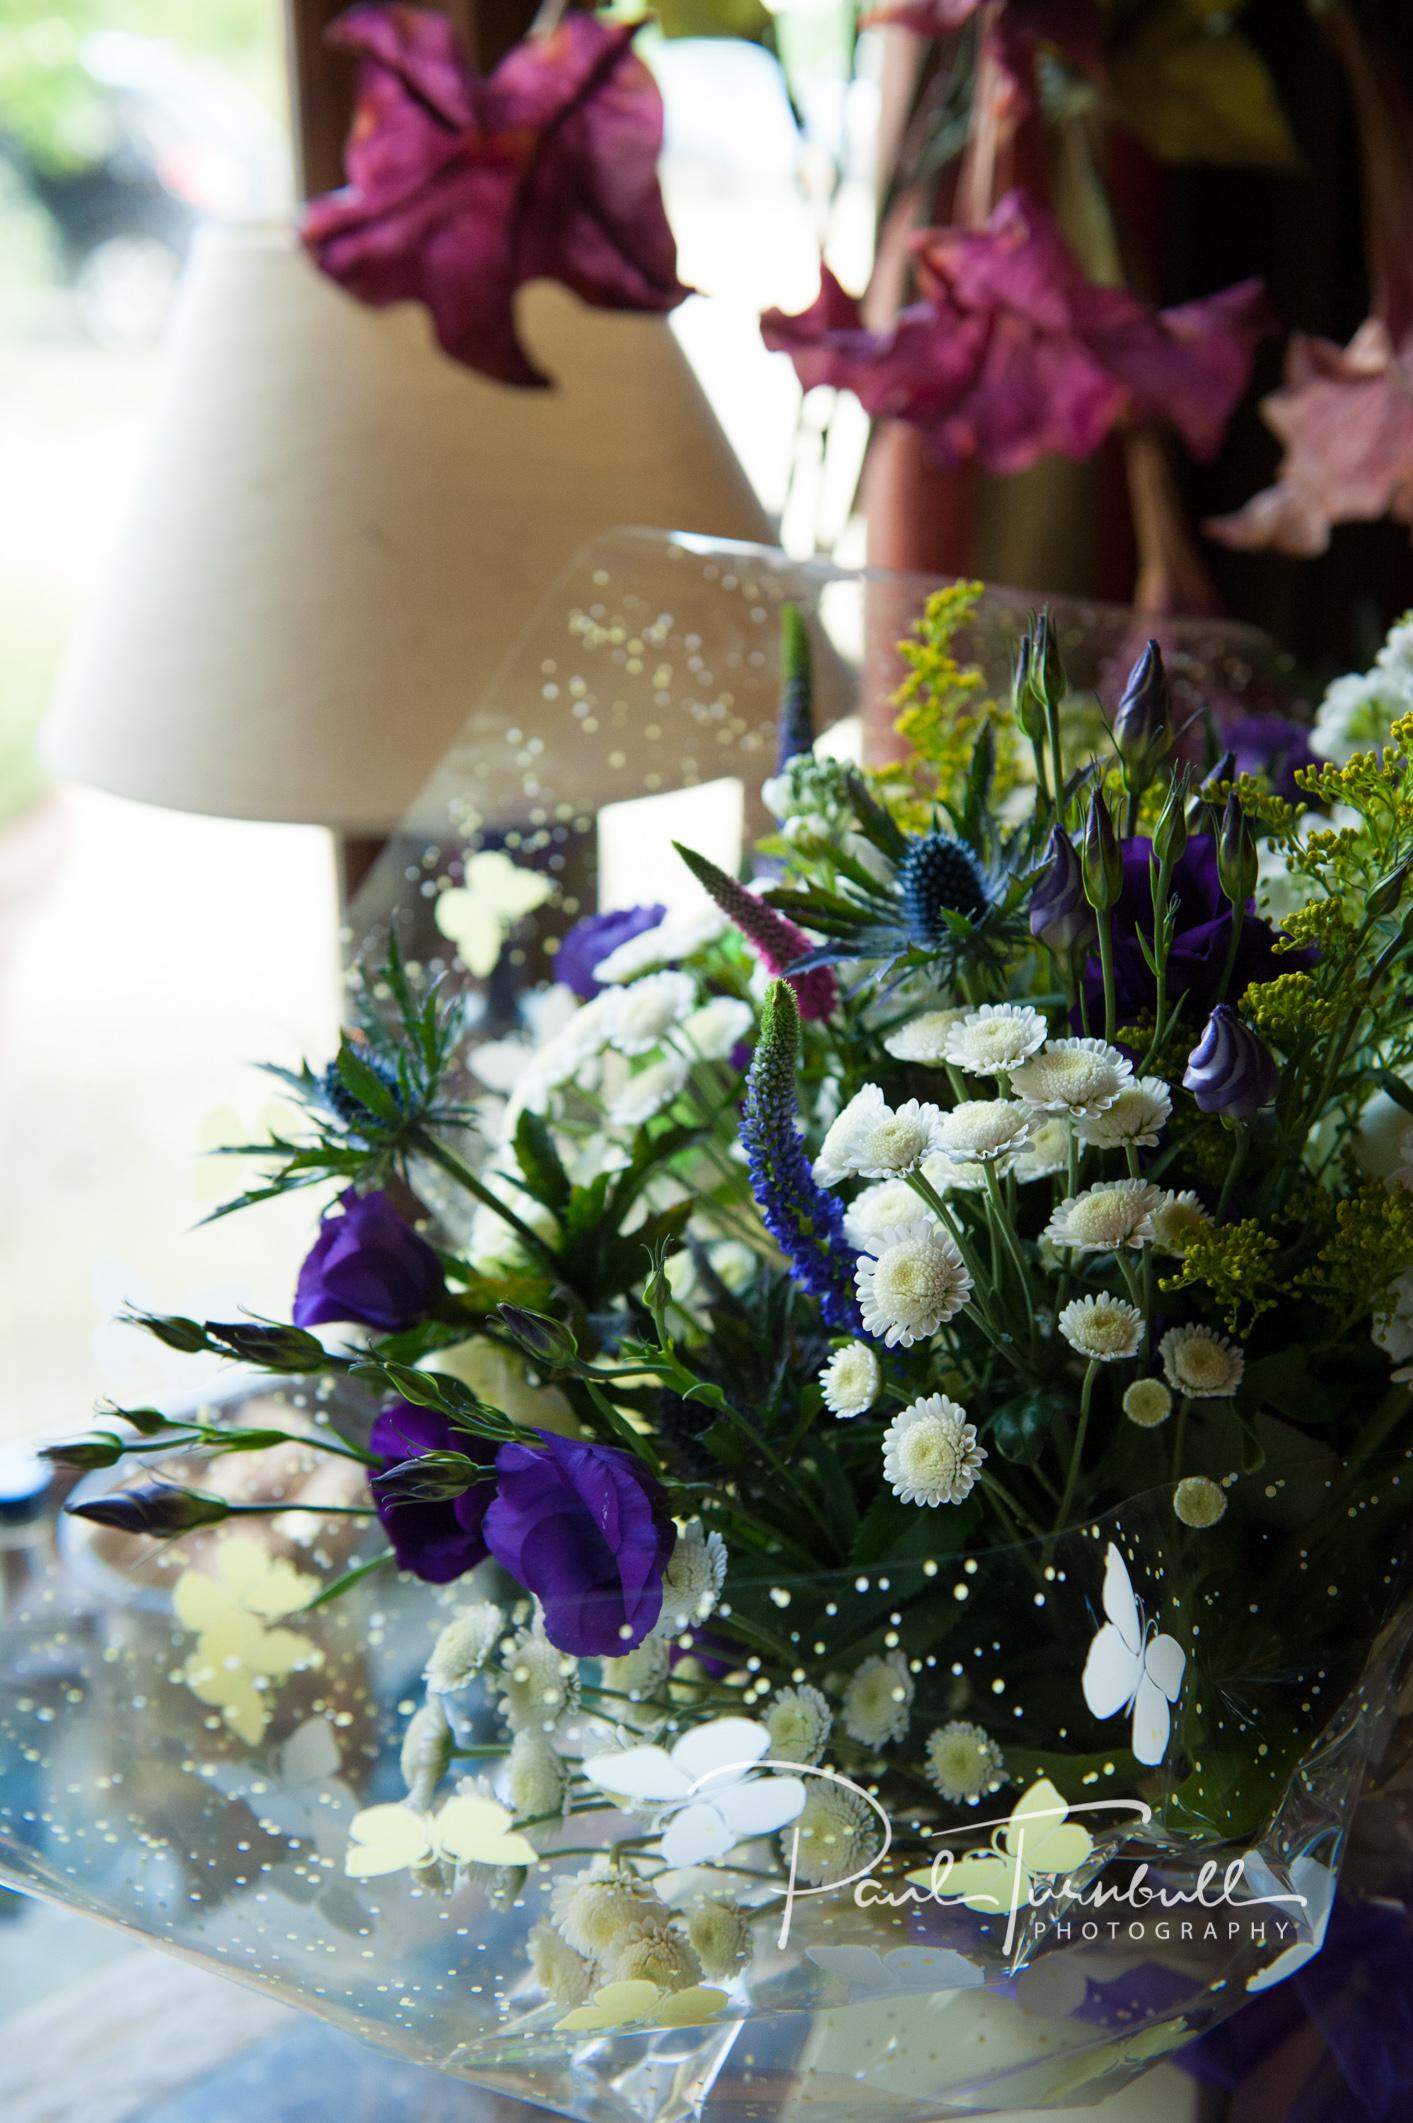 wedding-photography-star-inn-harome-yorkshire-007.jpg